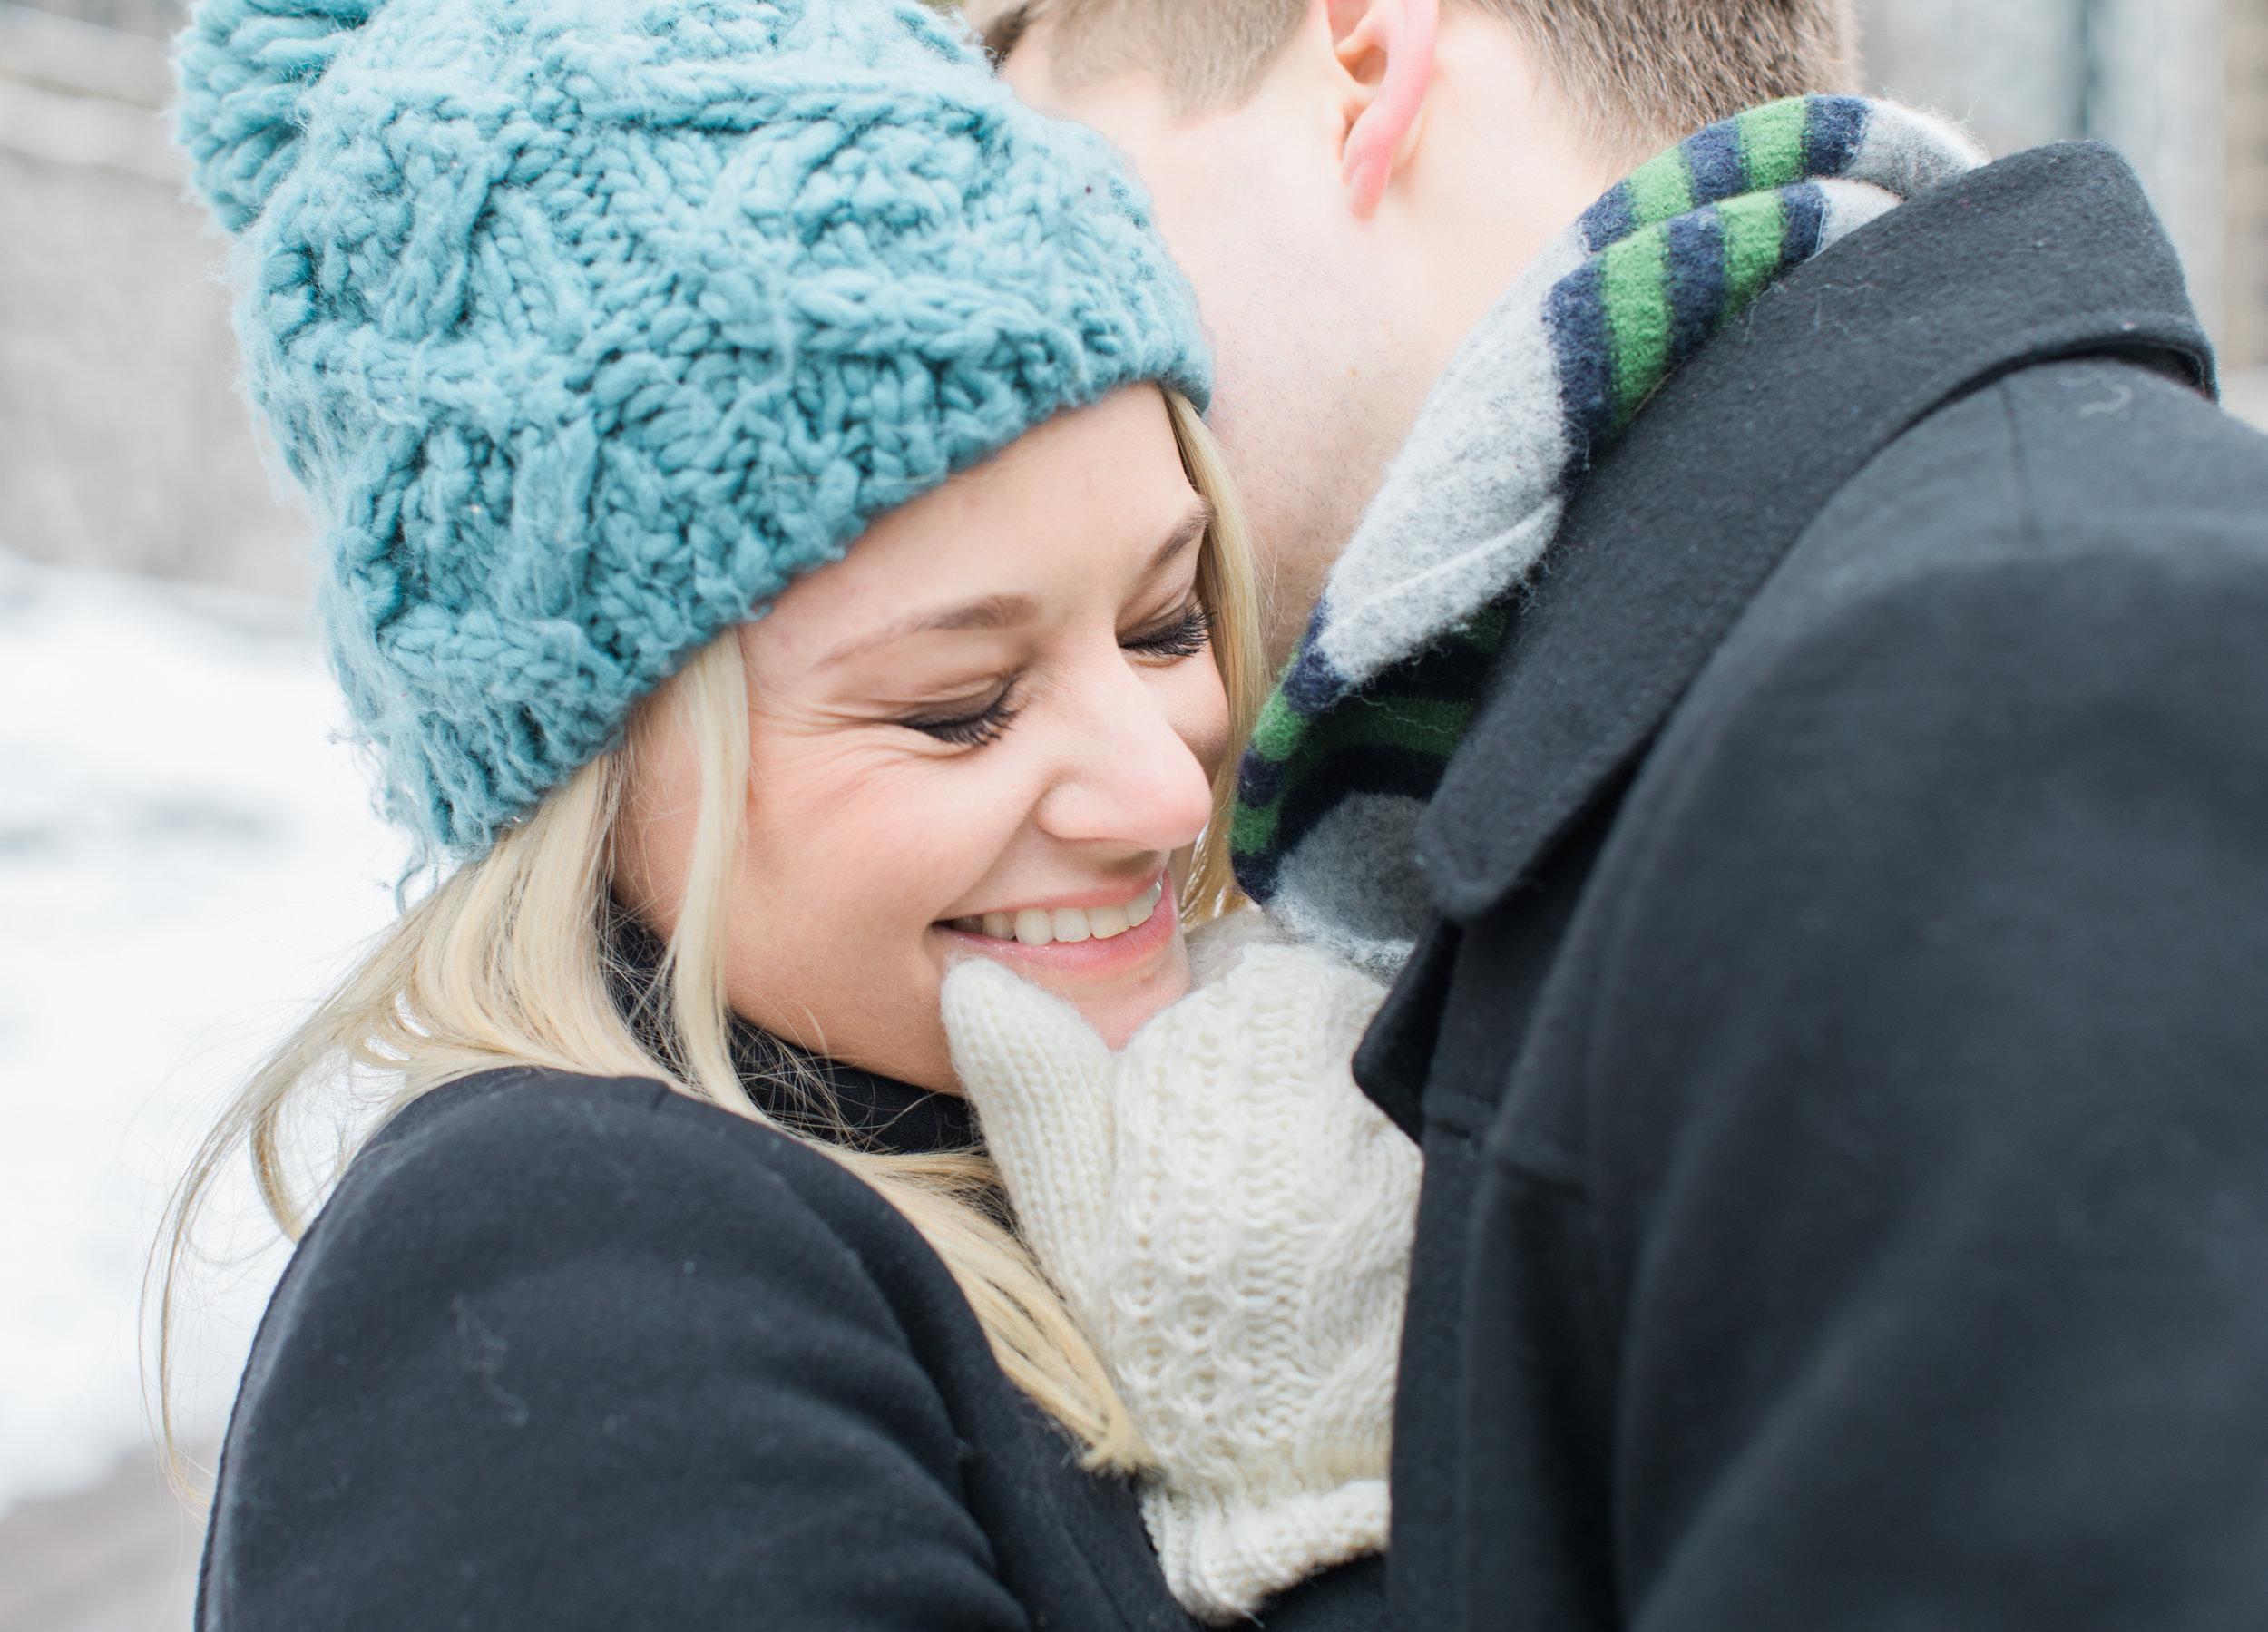 Bonphotage Winter Engagement Photography